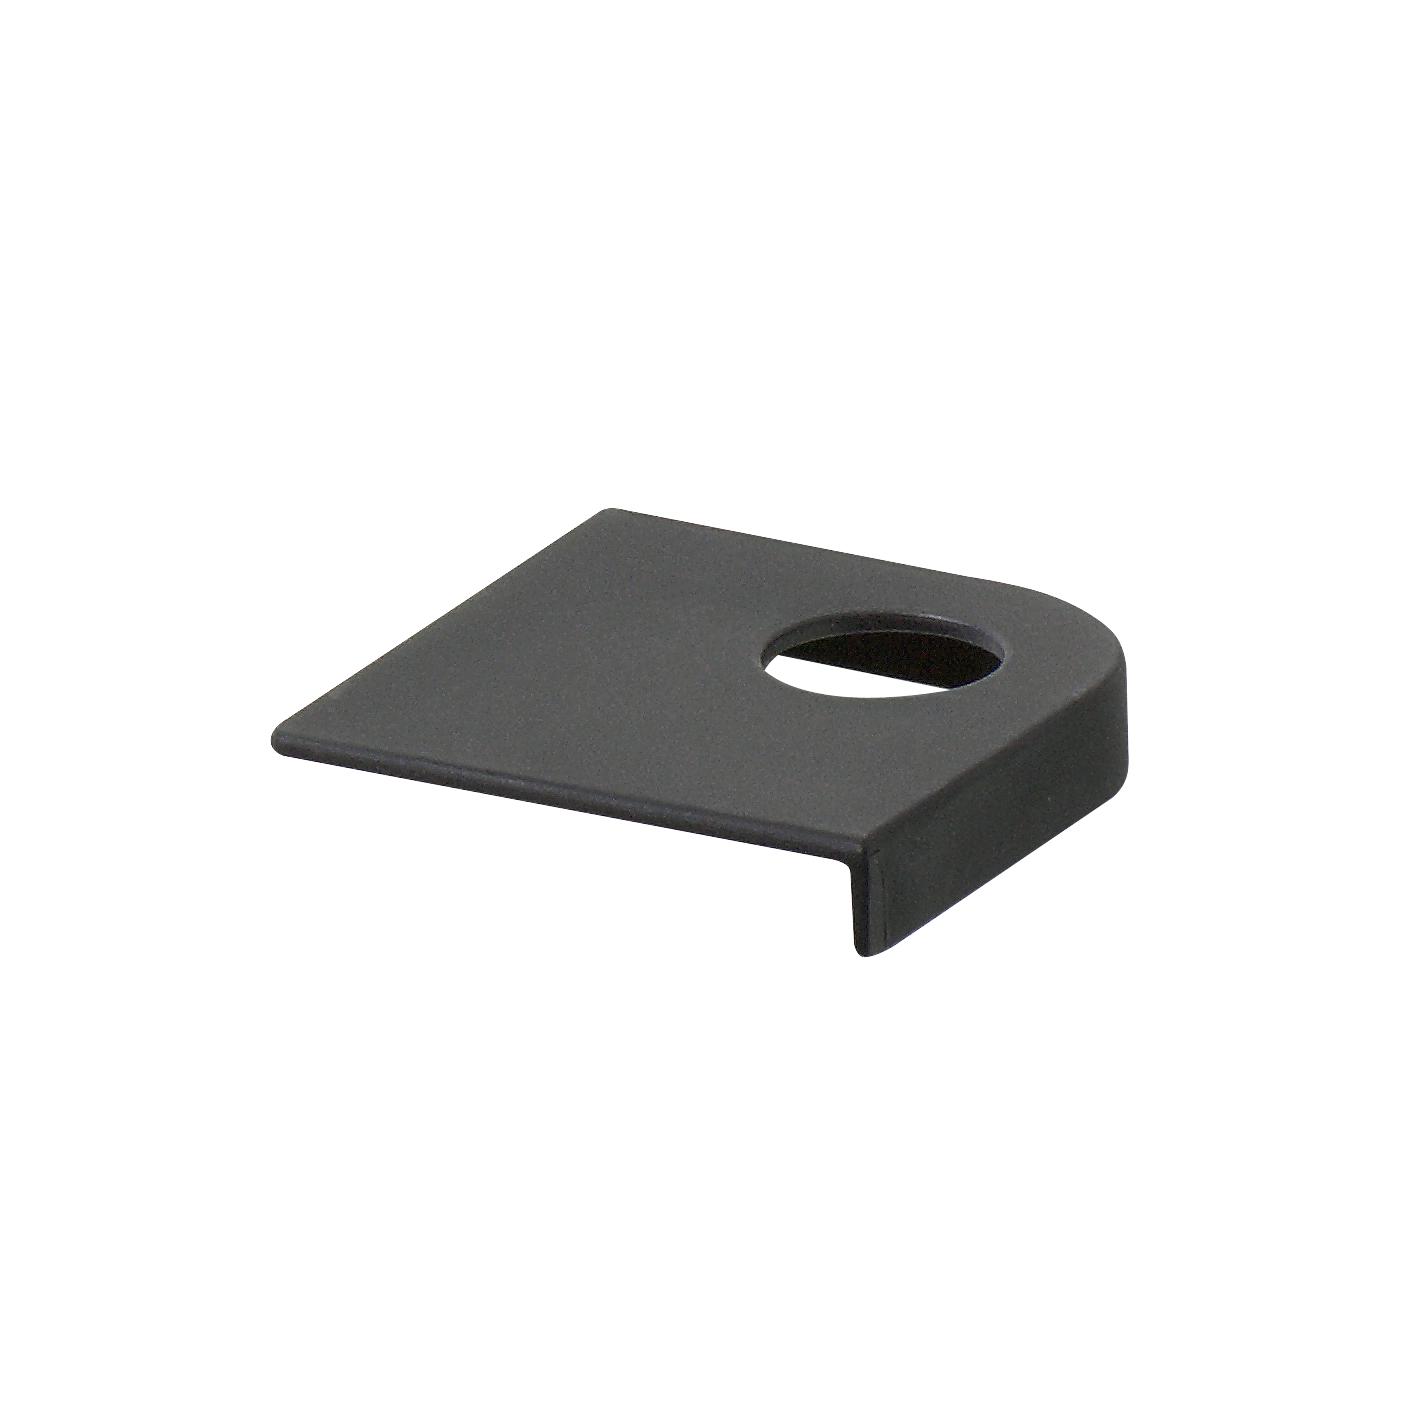 fuellschachtdeckel-cubico-cube-trio_product_listingimage